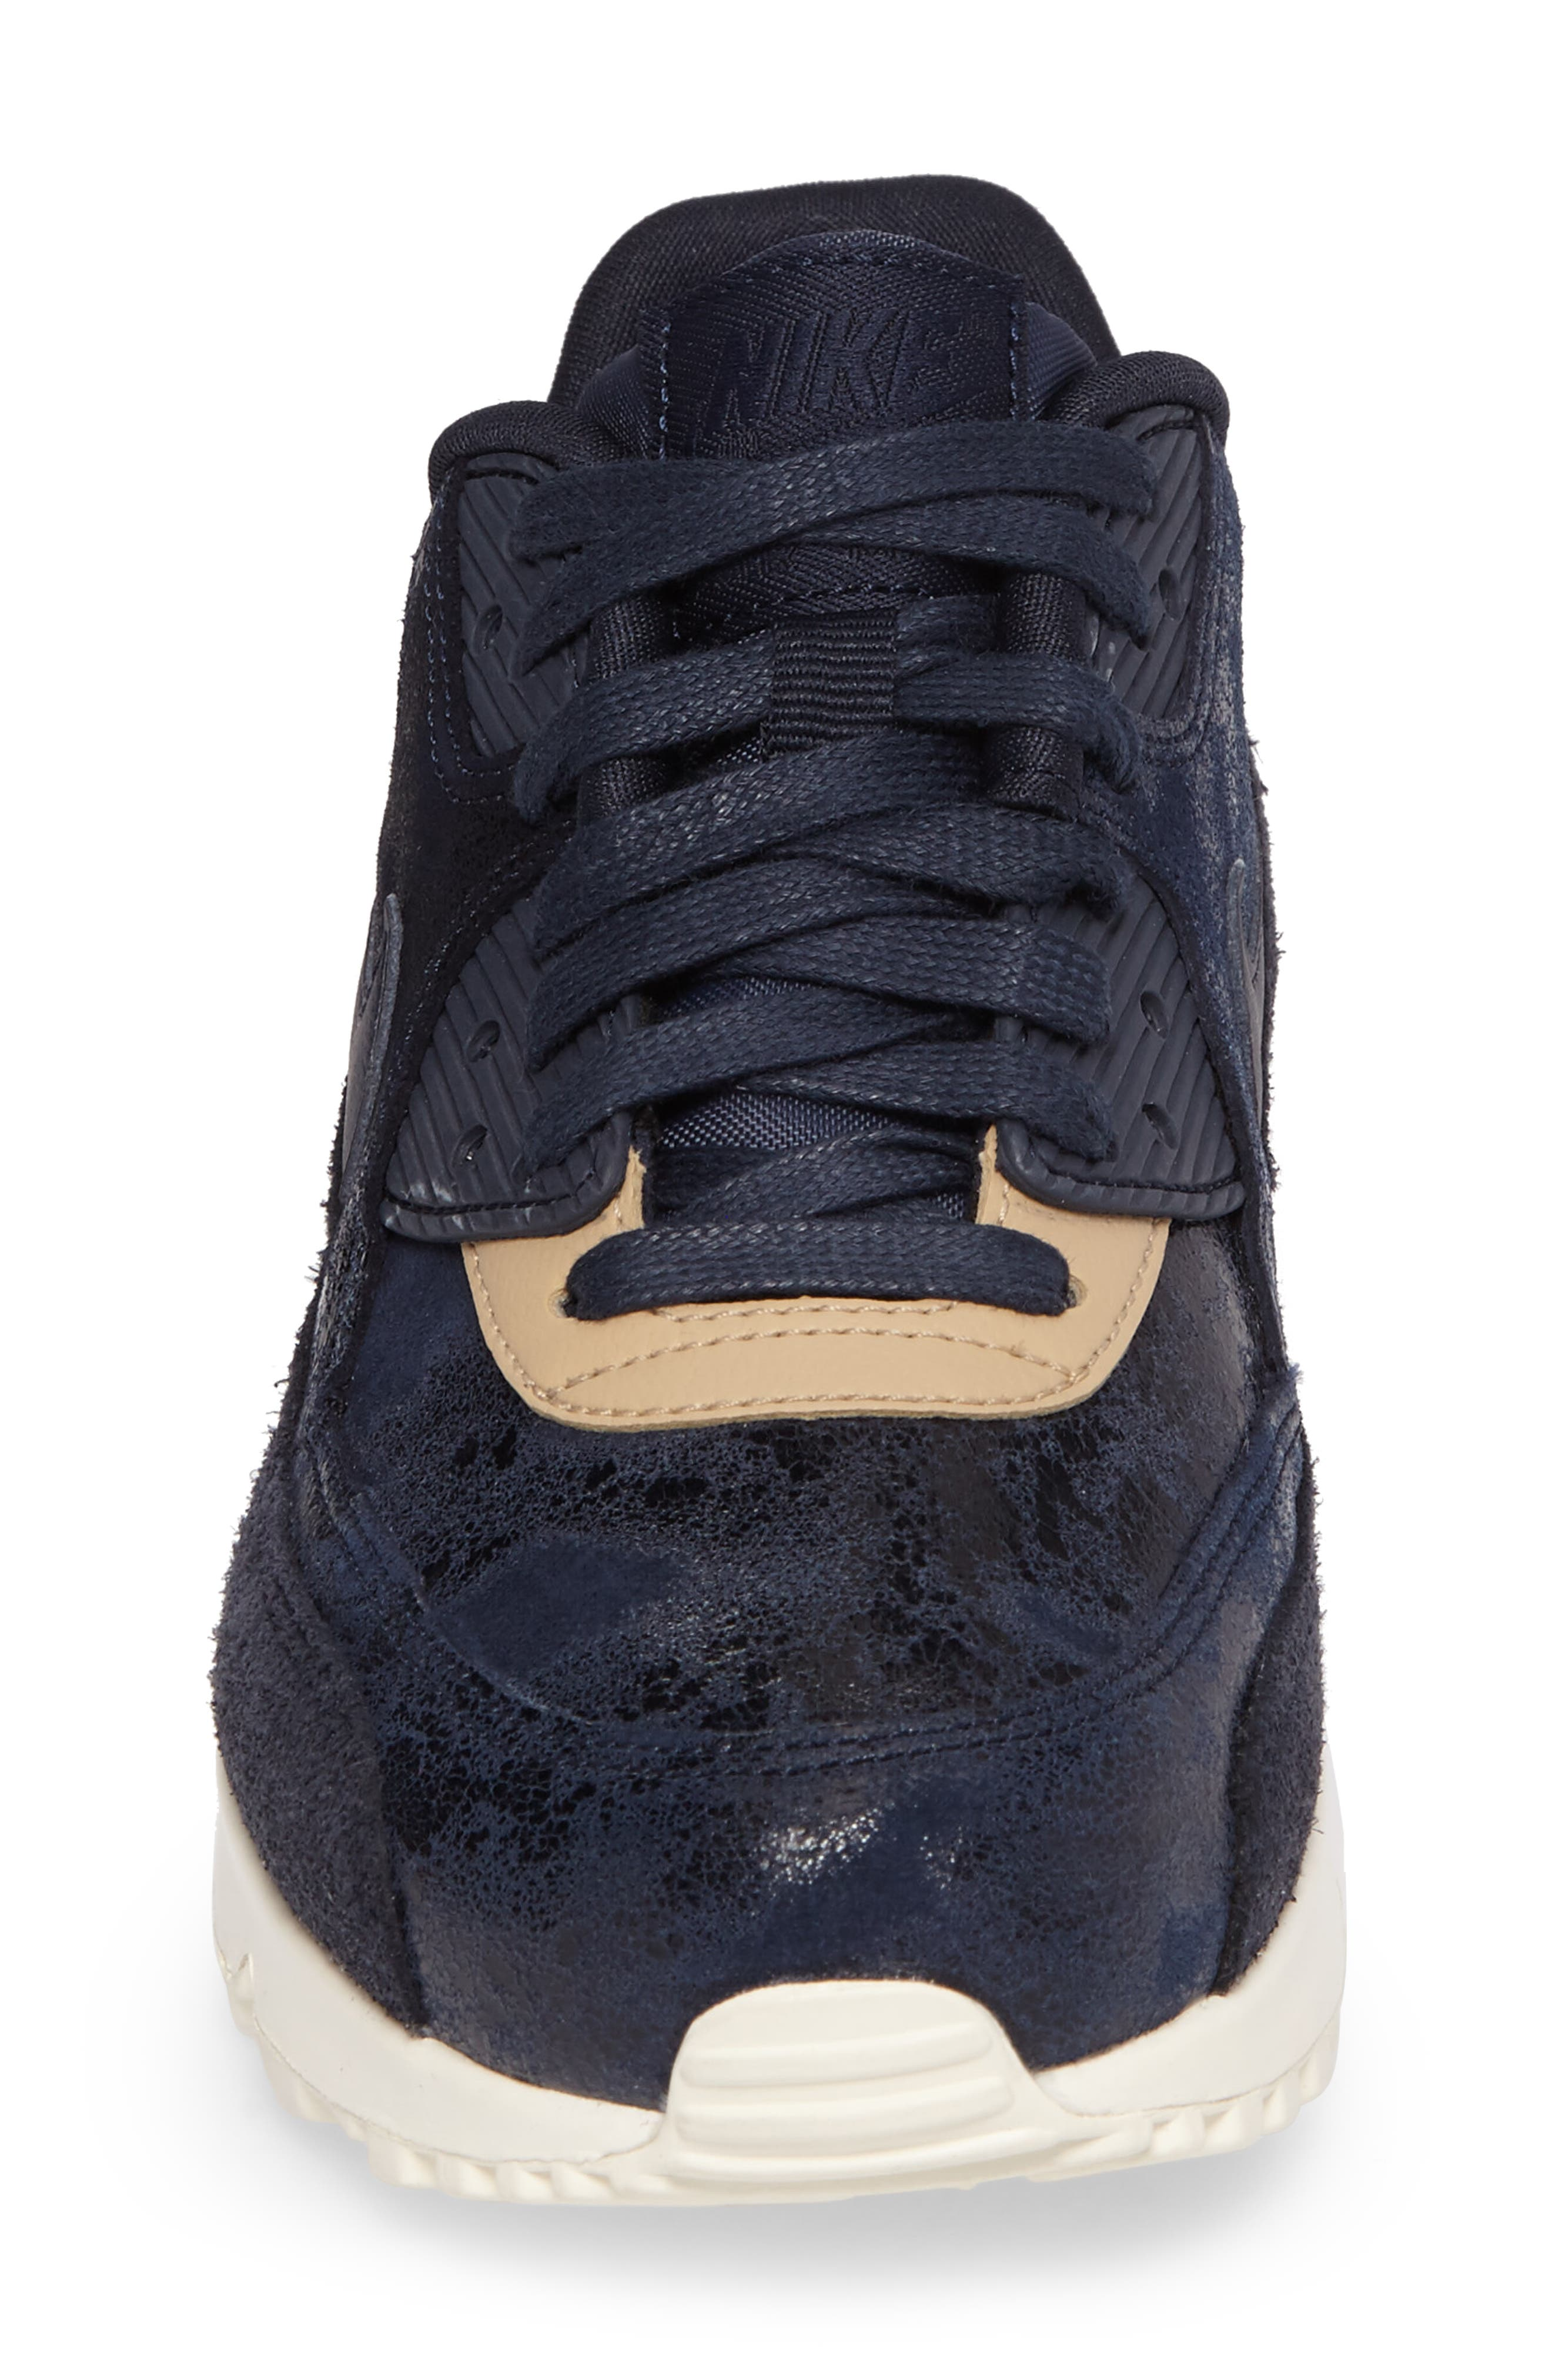 Air Max 90 Premium Sneaker,                             Alternate thumbnail 4, color,                             Dark Obsidian/ Sail/ Mushroom